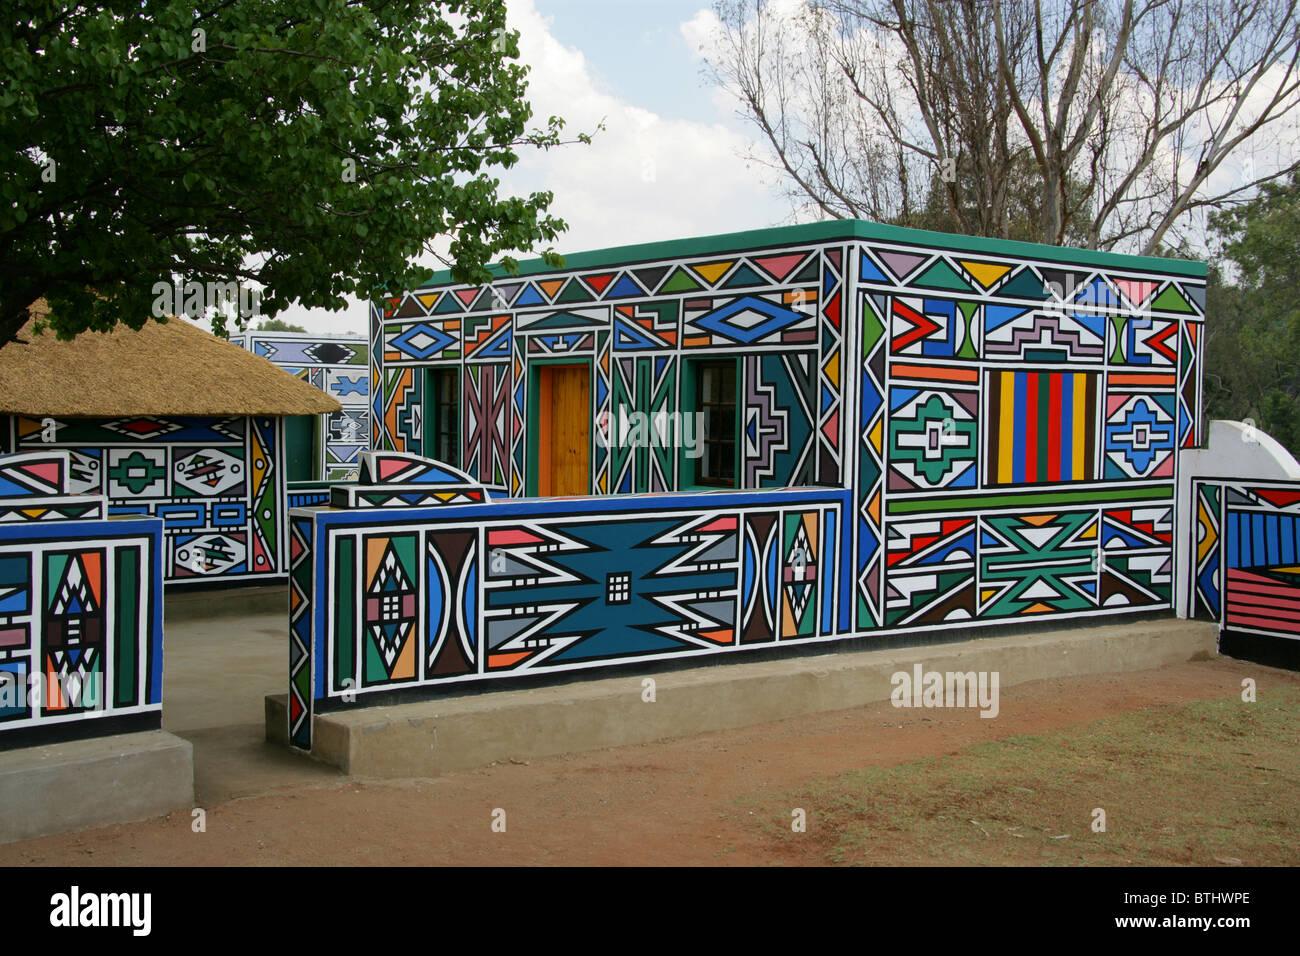 Ndebele Cultural Village, Botshabelo, South Africa Stock ...